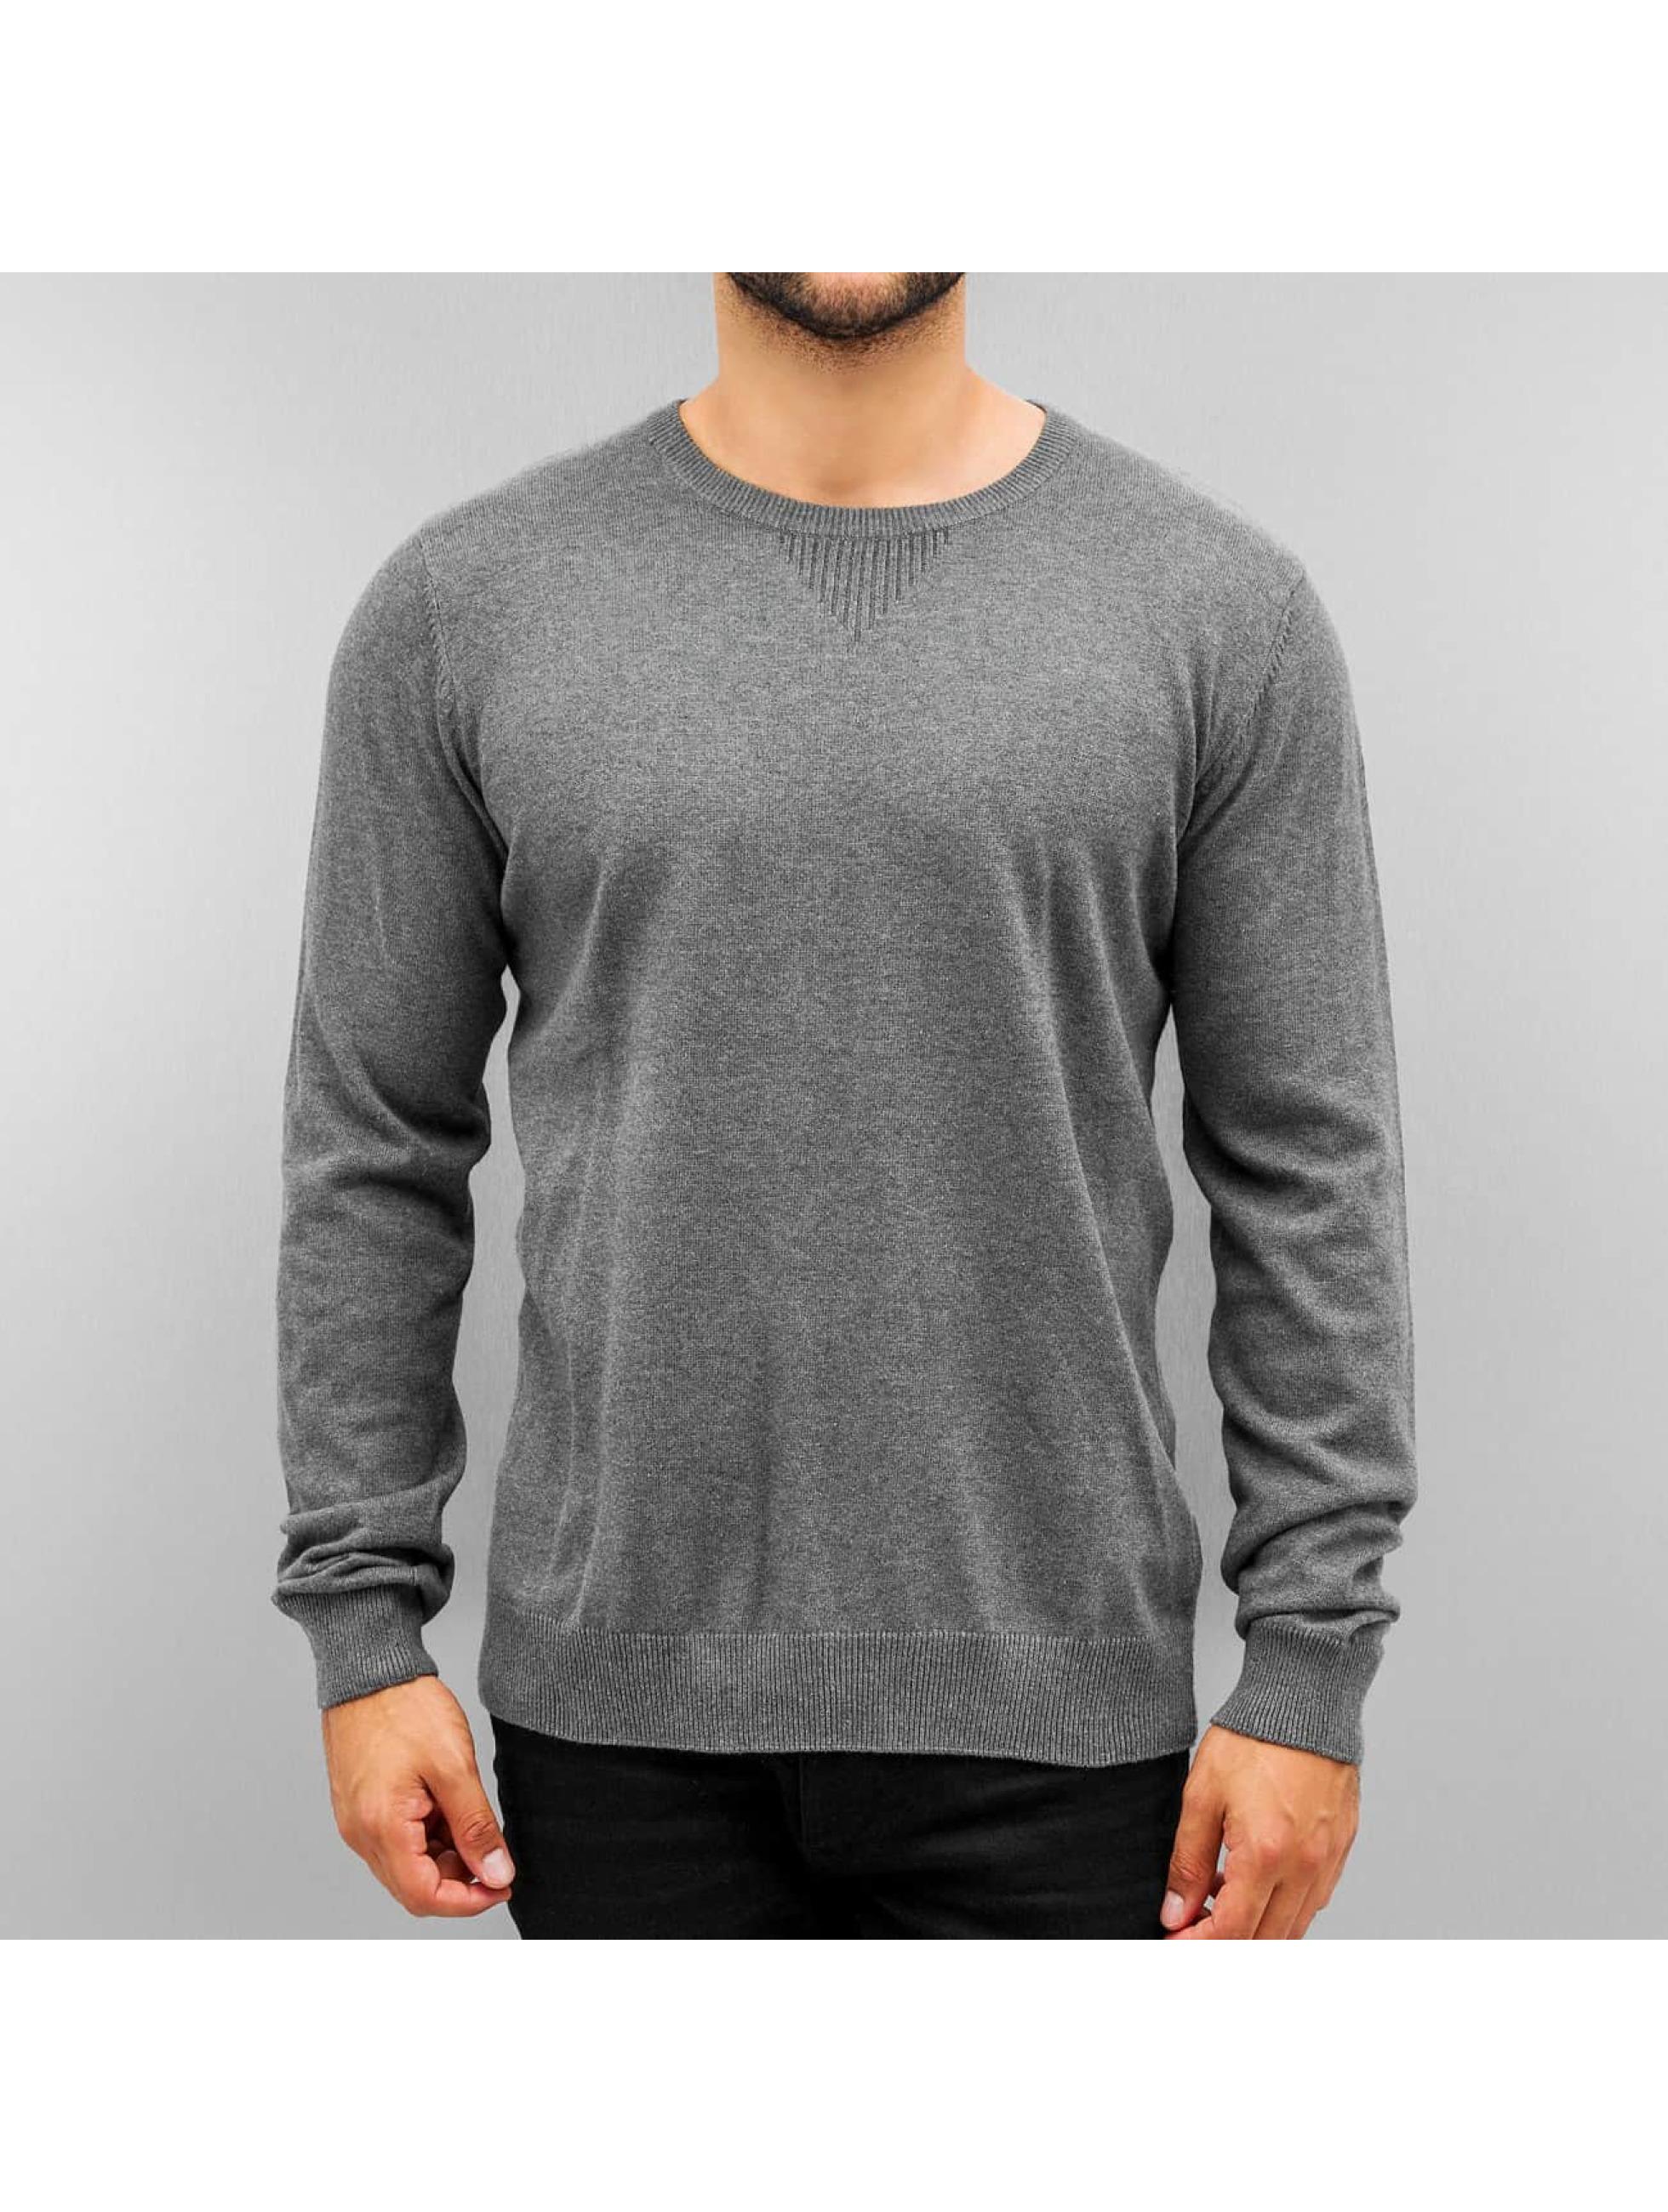 SHINE Original Пуловер Basic серый